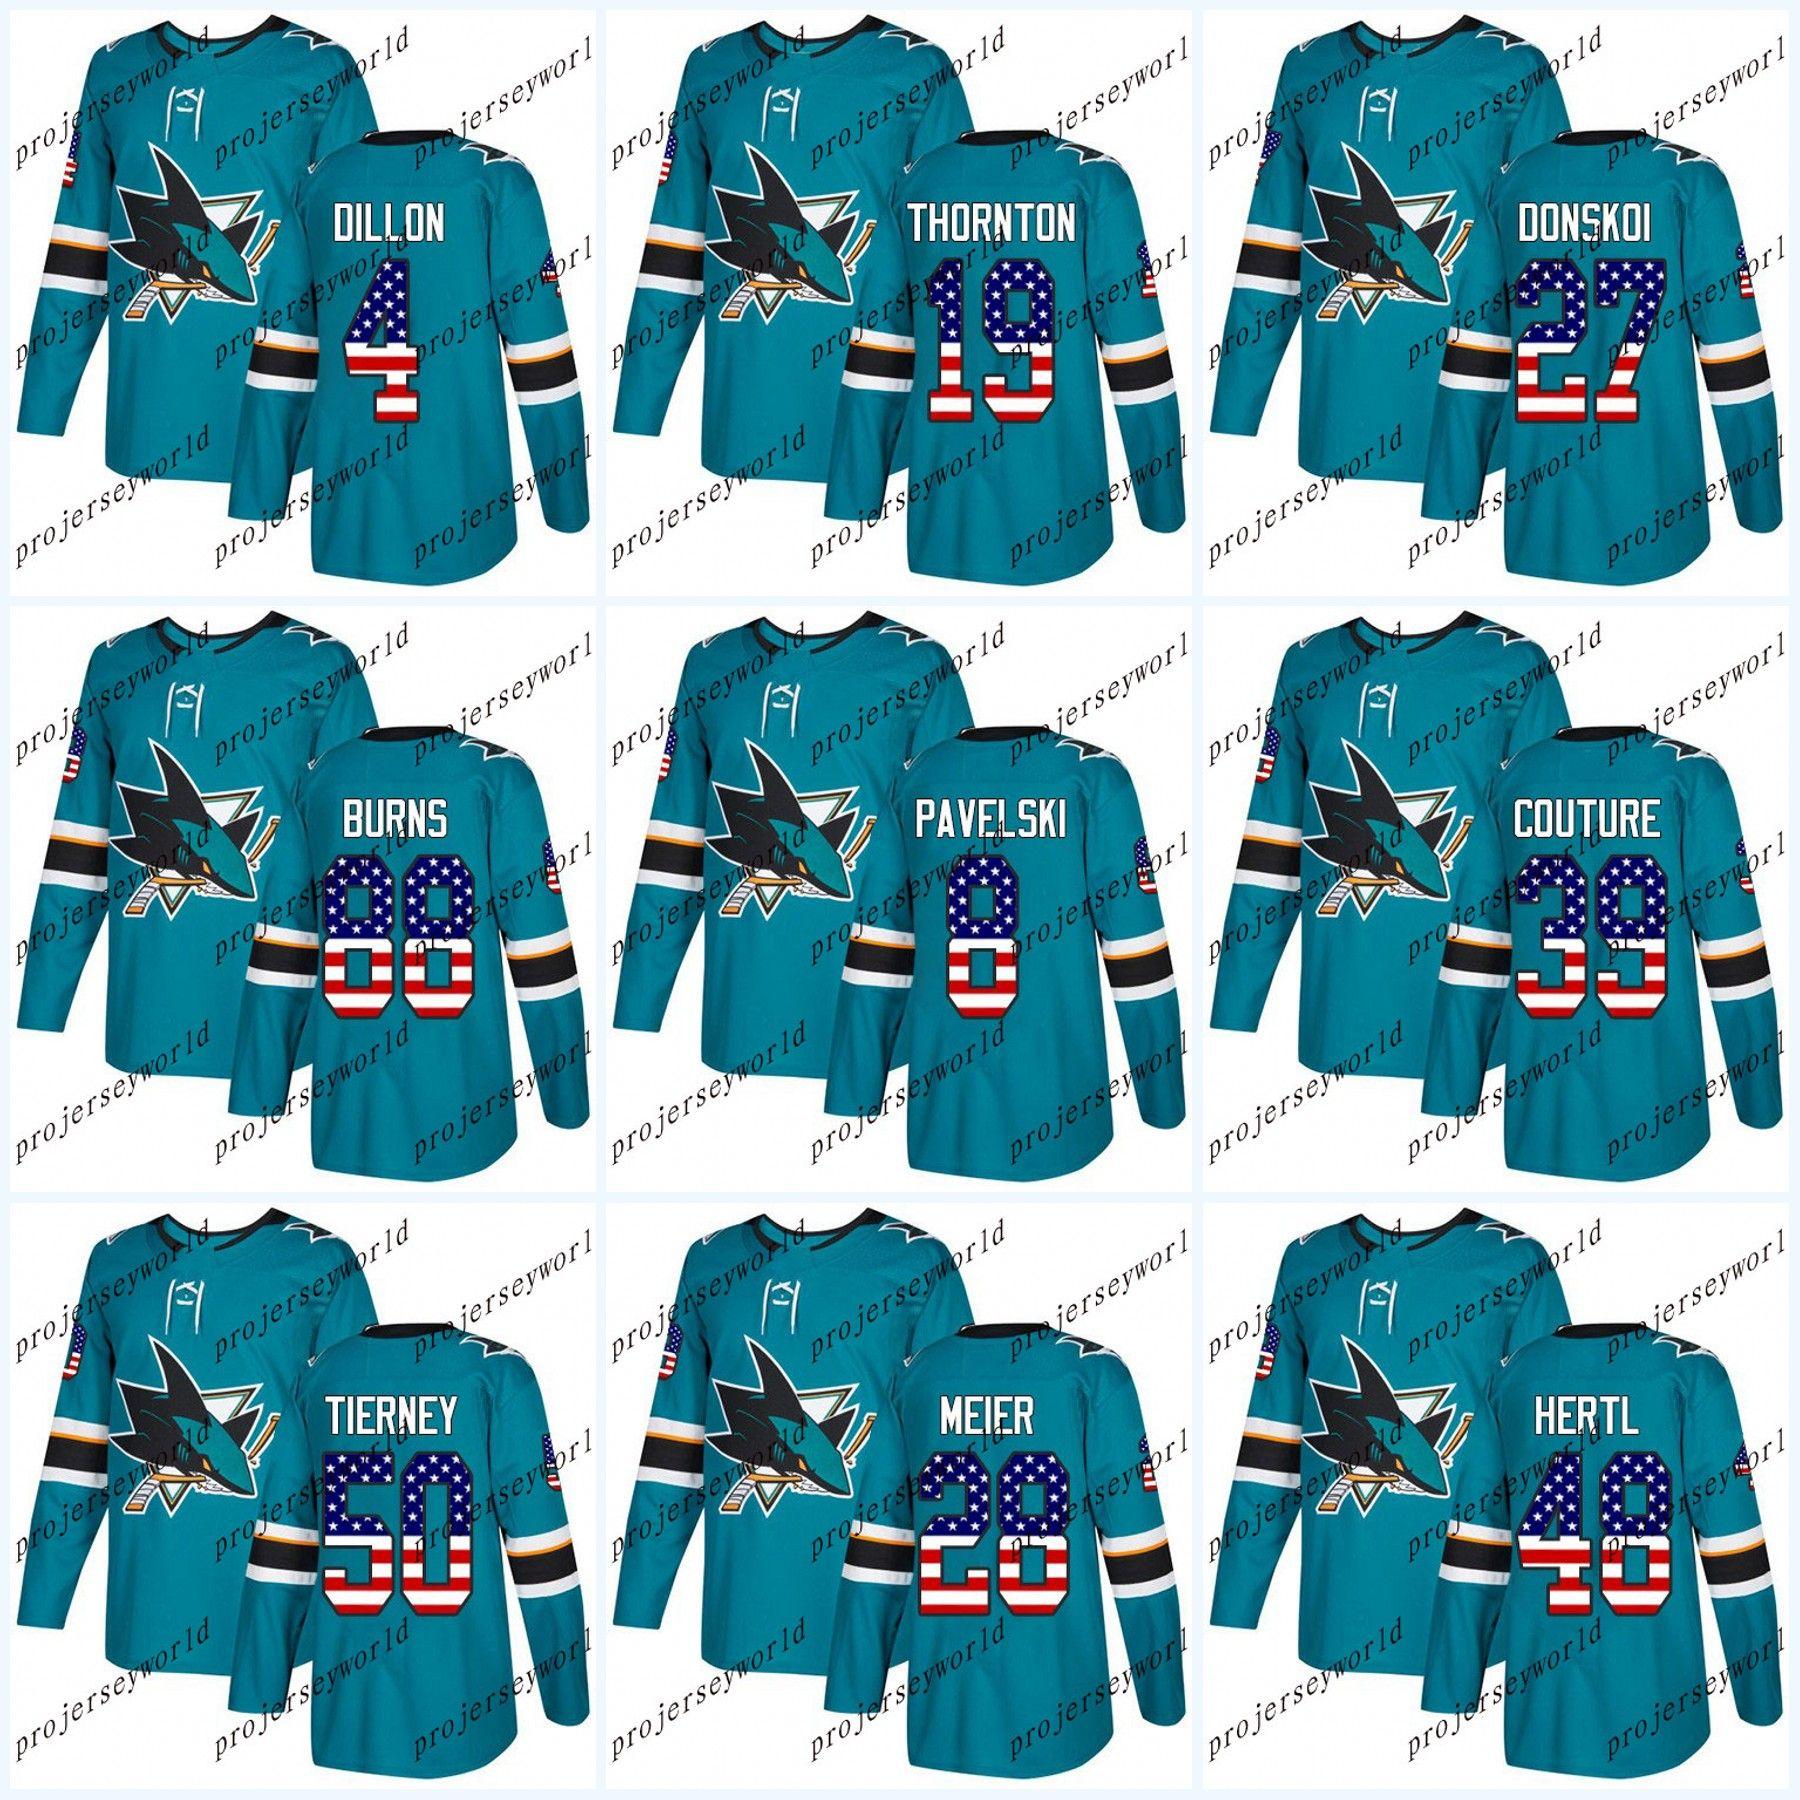 05b5fc02c USA Flag Stitched San Jose Sharks 19 Joe Thornton 8 Joe Pavelski 88 ...